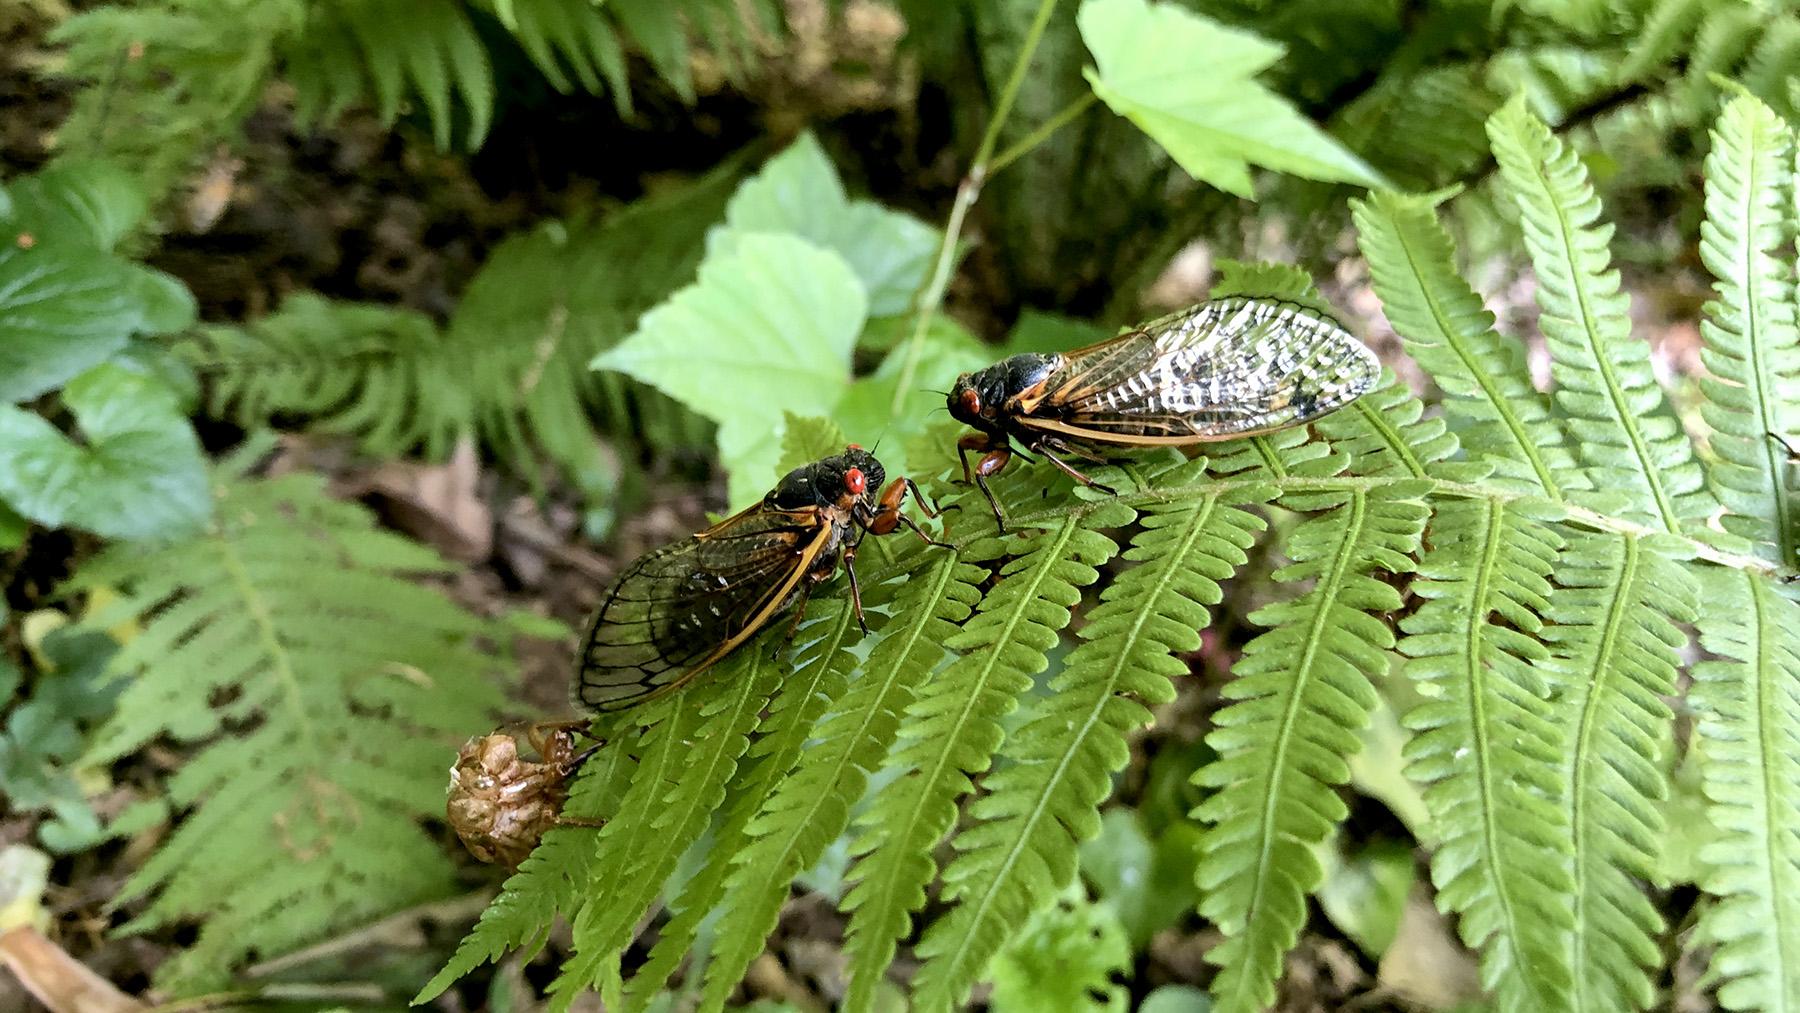 Two Brood X adults of the genus Magicicada rest on a fern leaf.  Photo by Marianne Alleyne